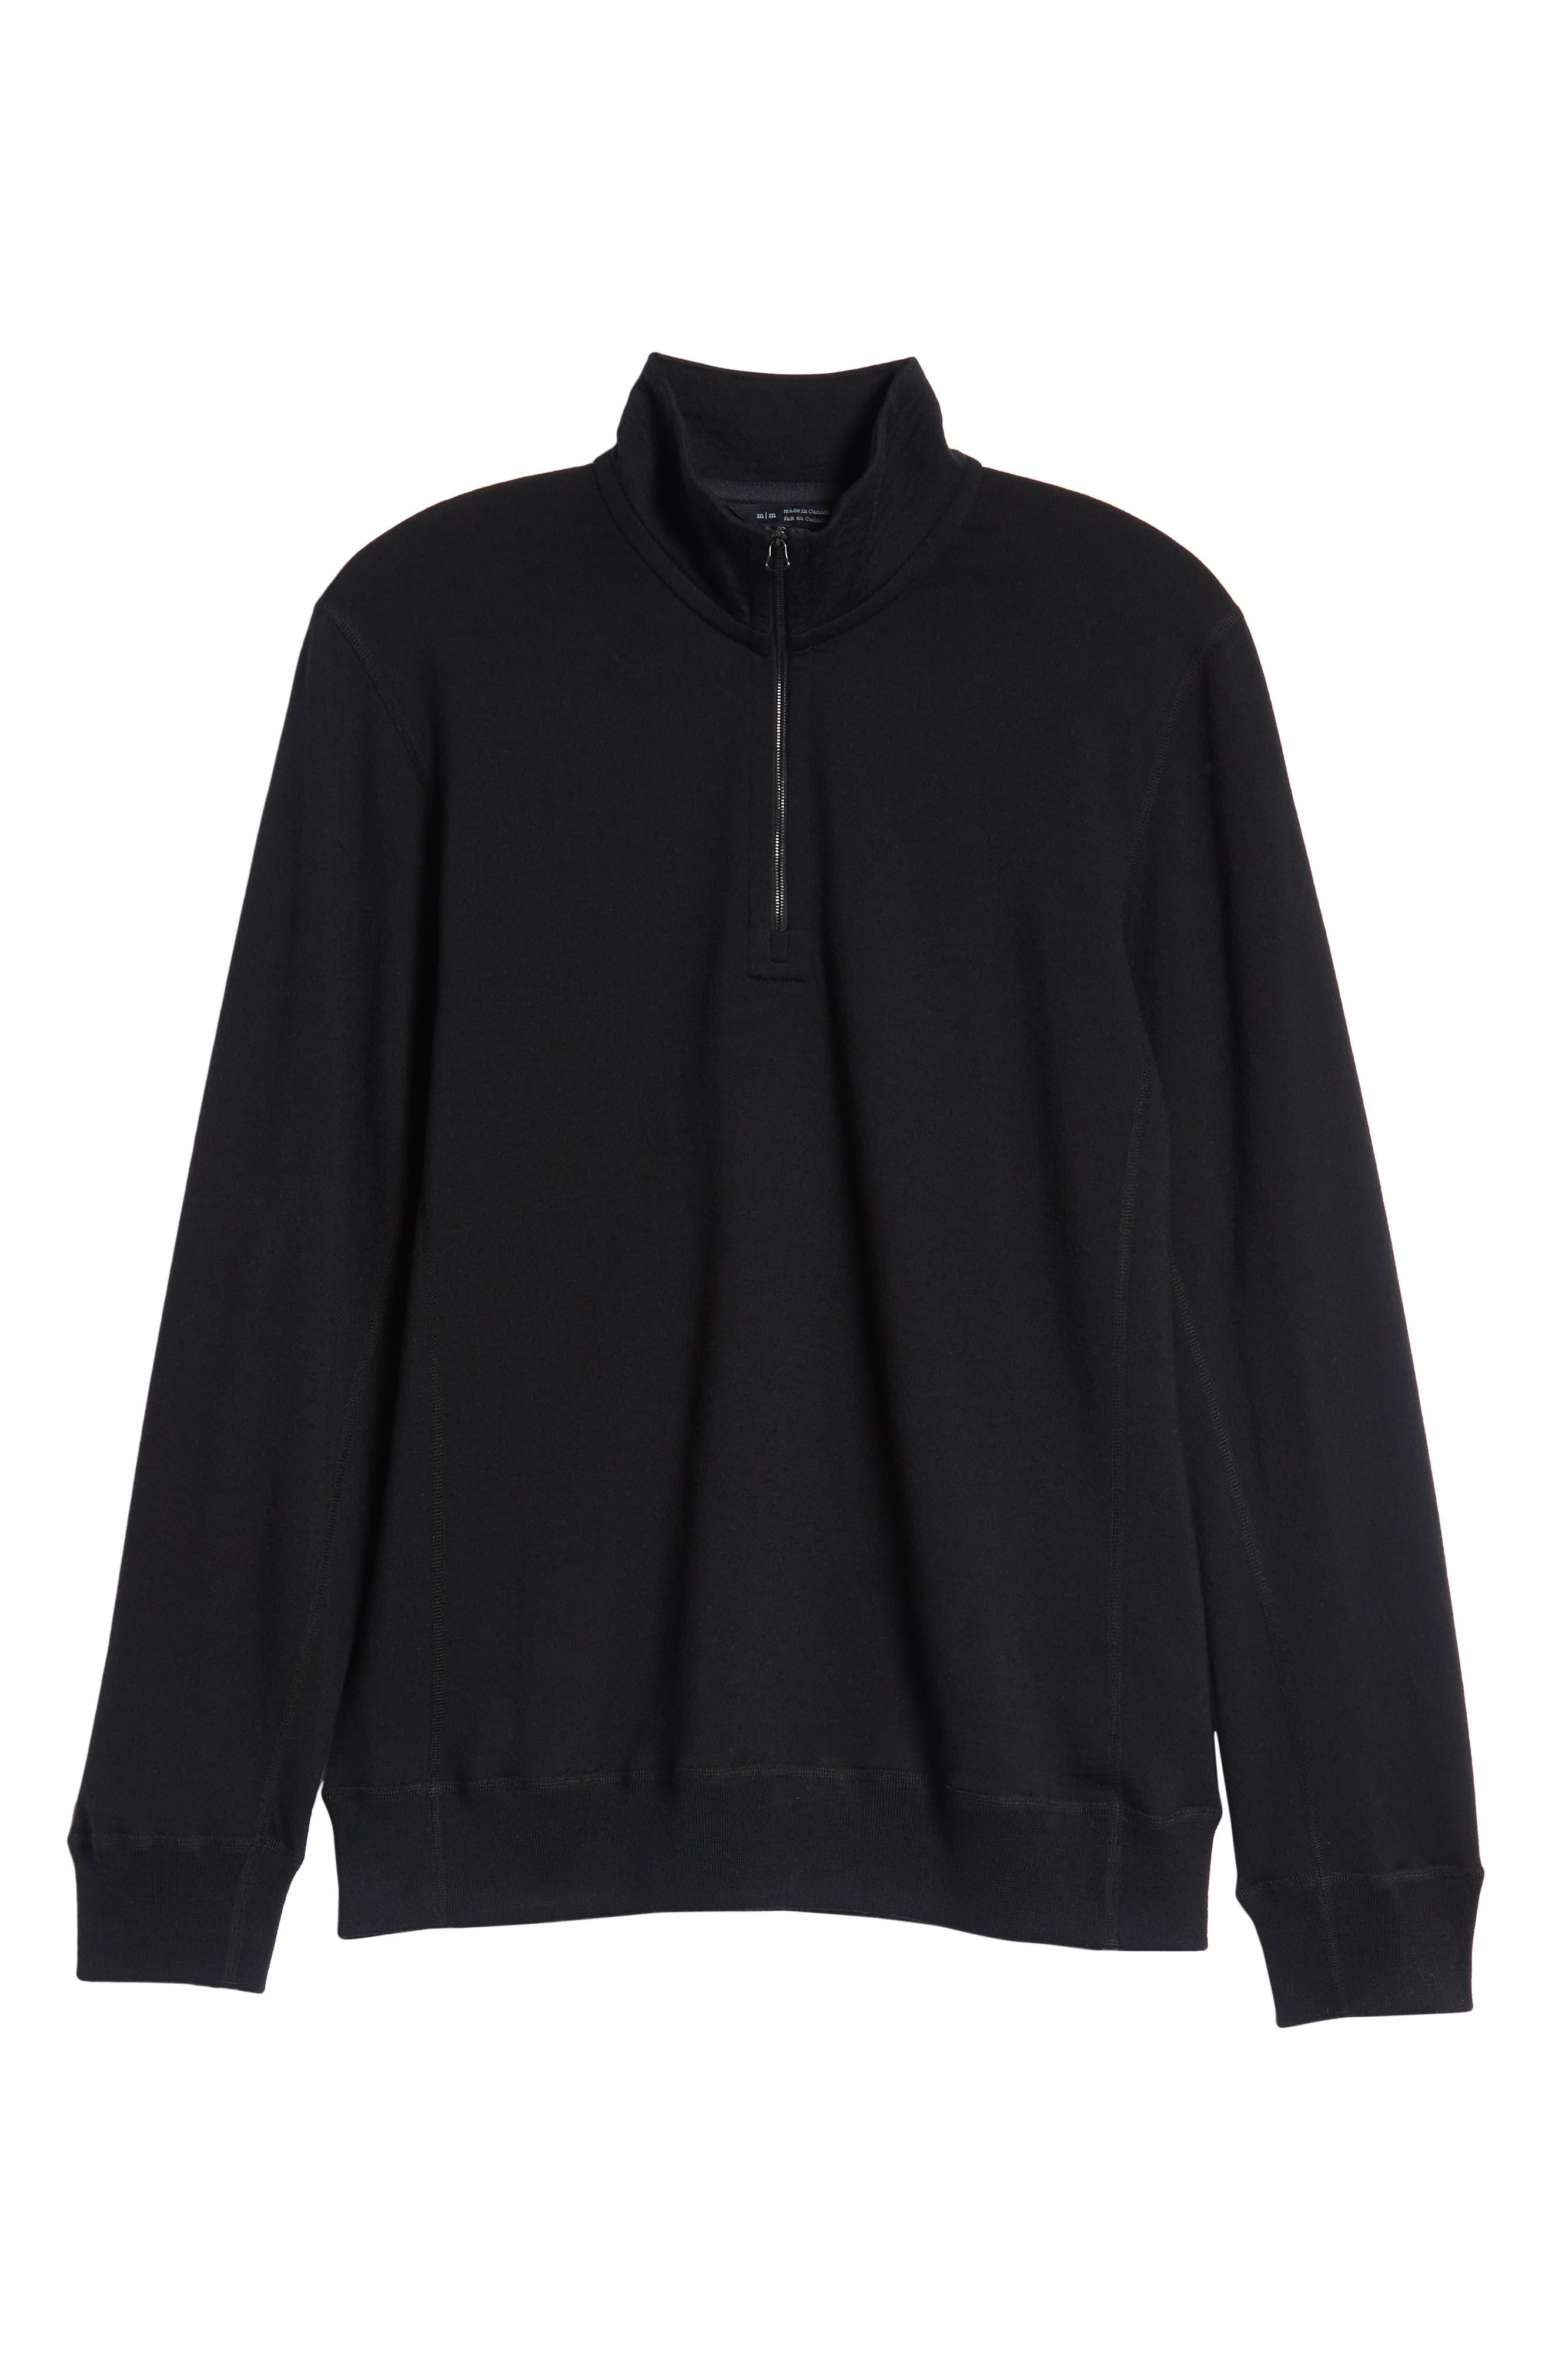 Swedish Merino Wool Trail Shirt,                             Alternate thumbnail 6, color,                             BLACK